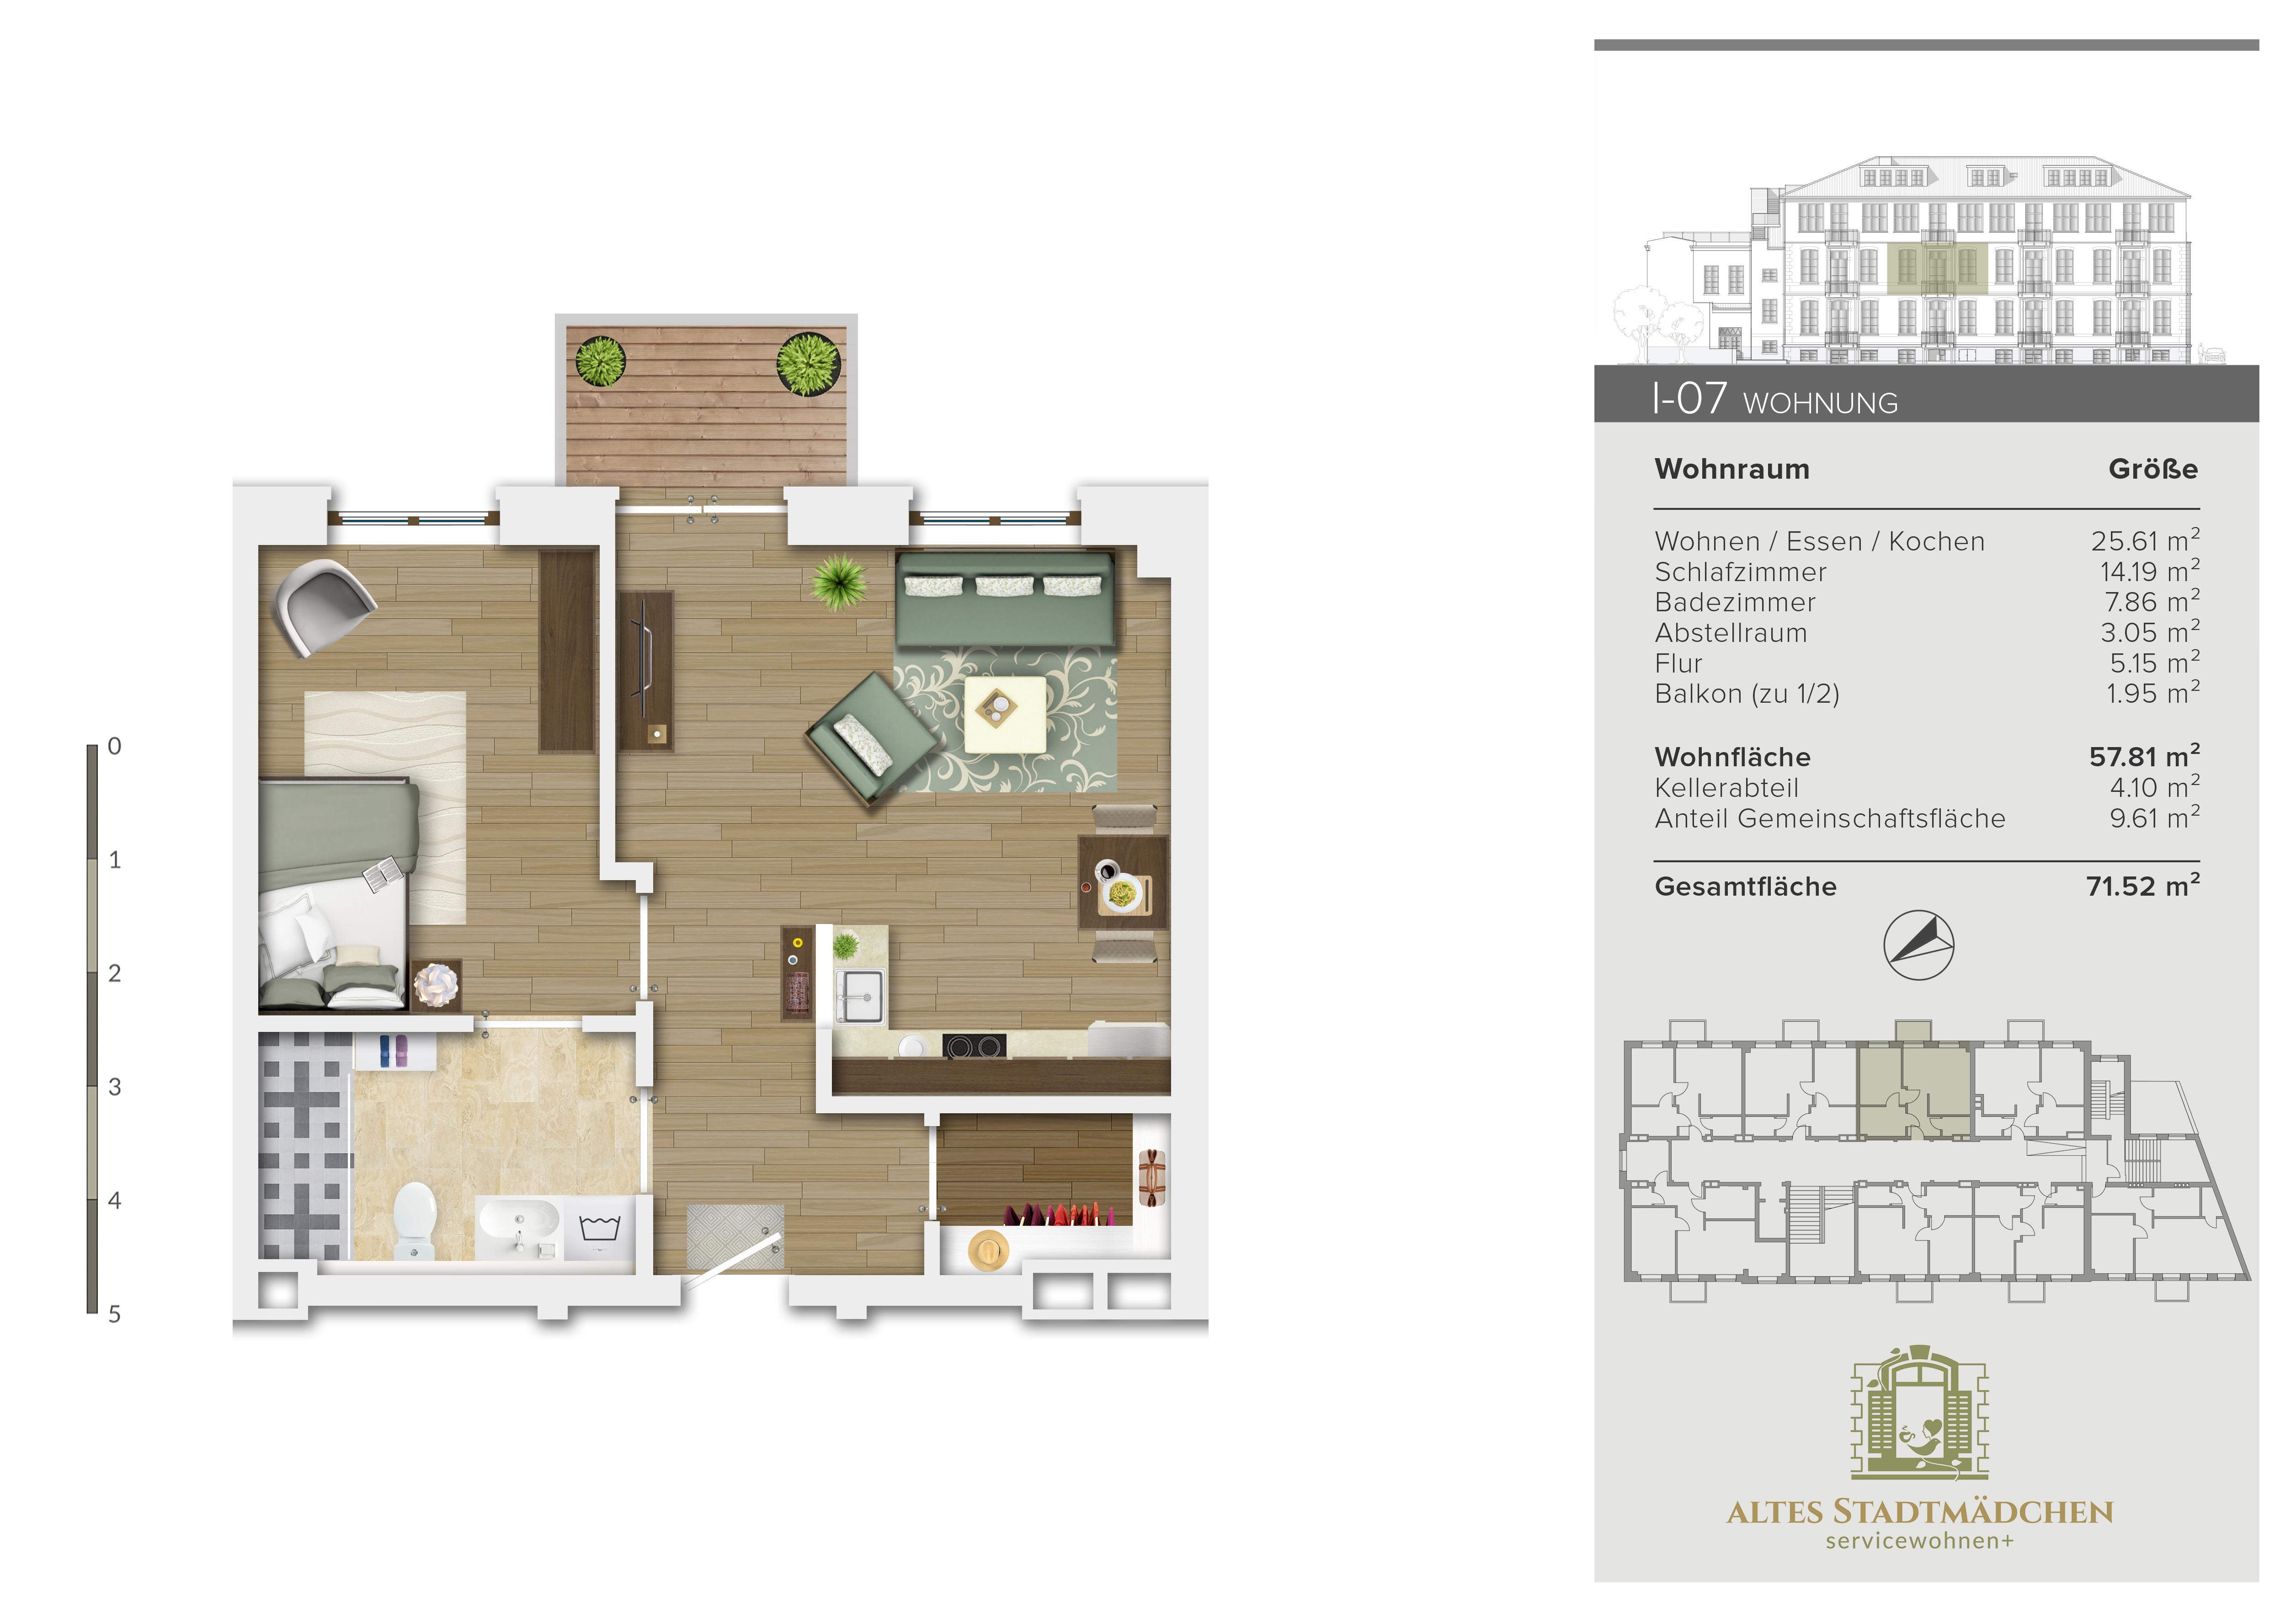 Wohnung I-07